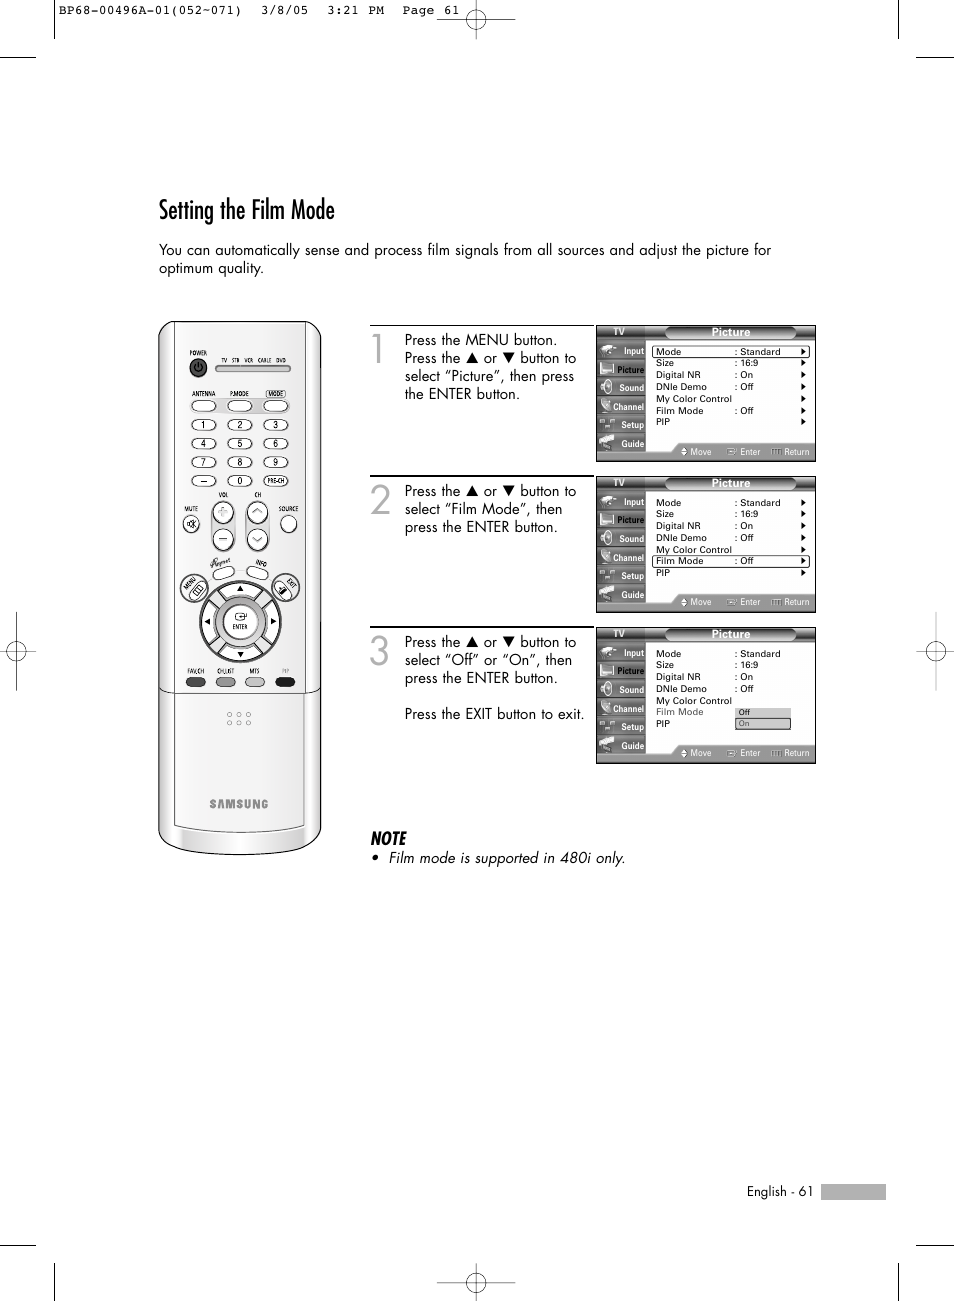 setting the film mode samsung hlr4266wx xaa user manual page 61 rh manualsdir com